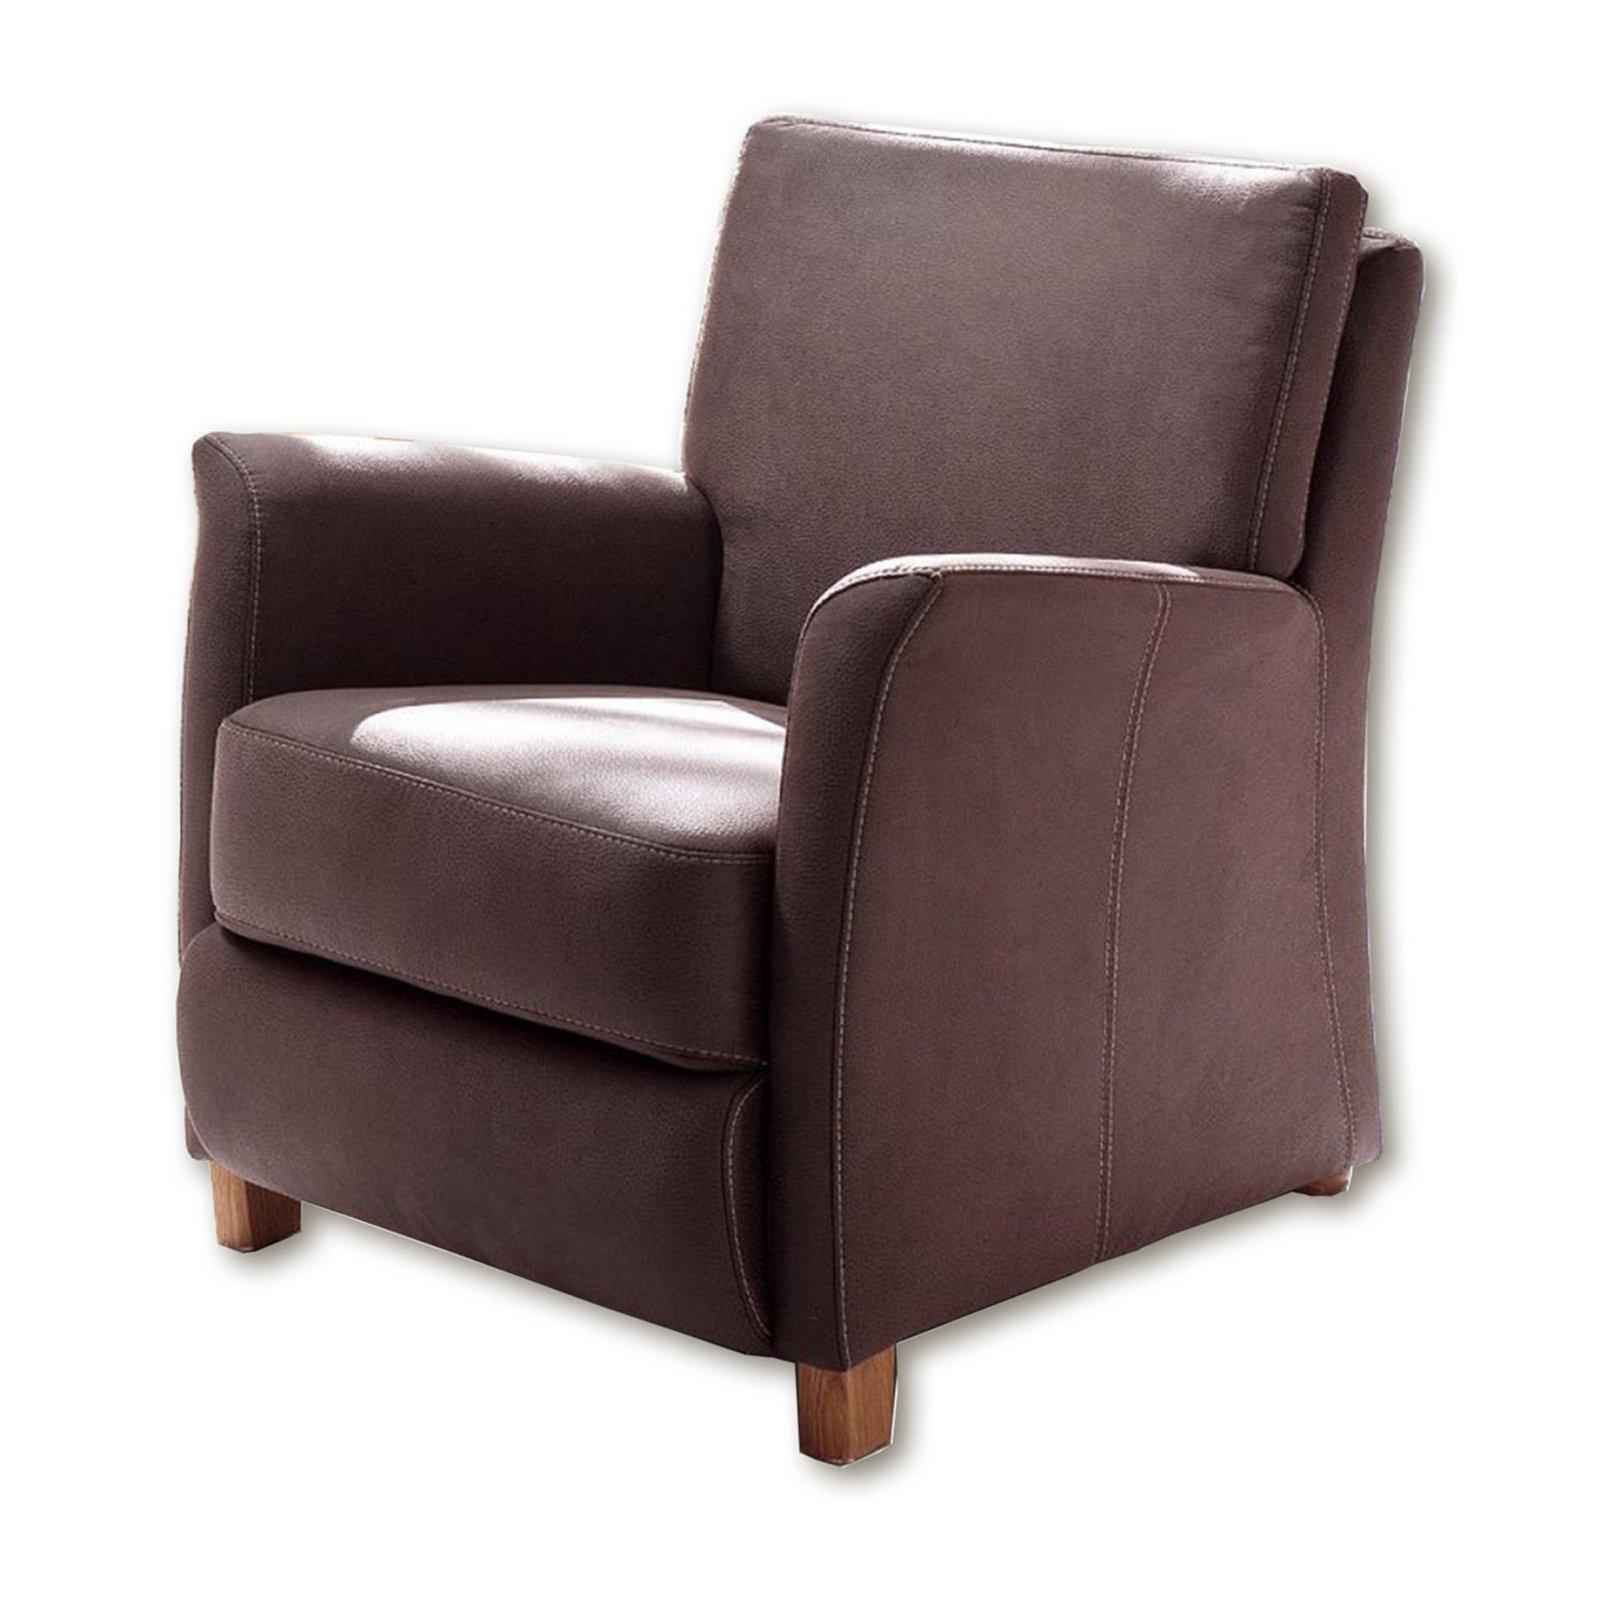 sessel braun microfaser fernseh relaxsessel sessel hocker m bel roller m belhaus. Black Bedroom Furniture Sets. Home Design Ideas